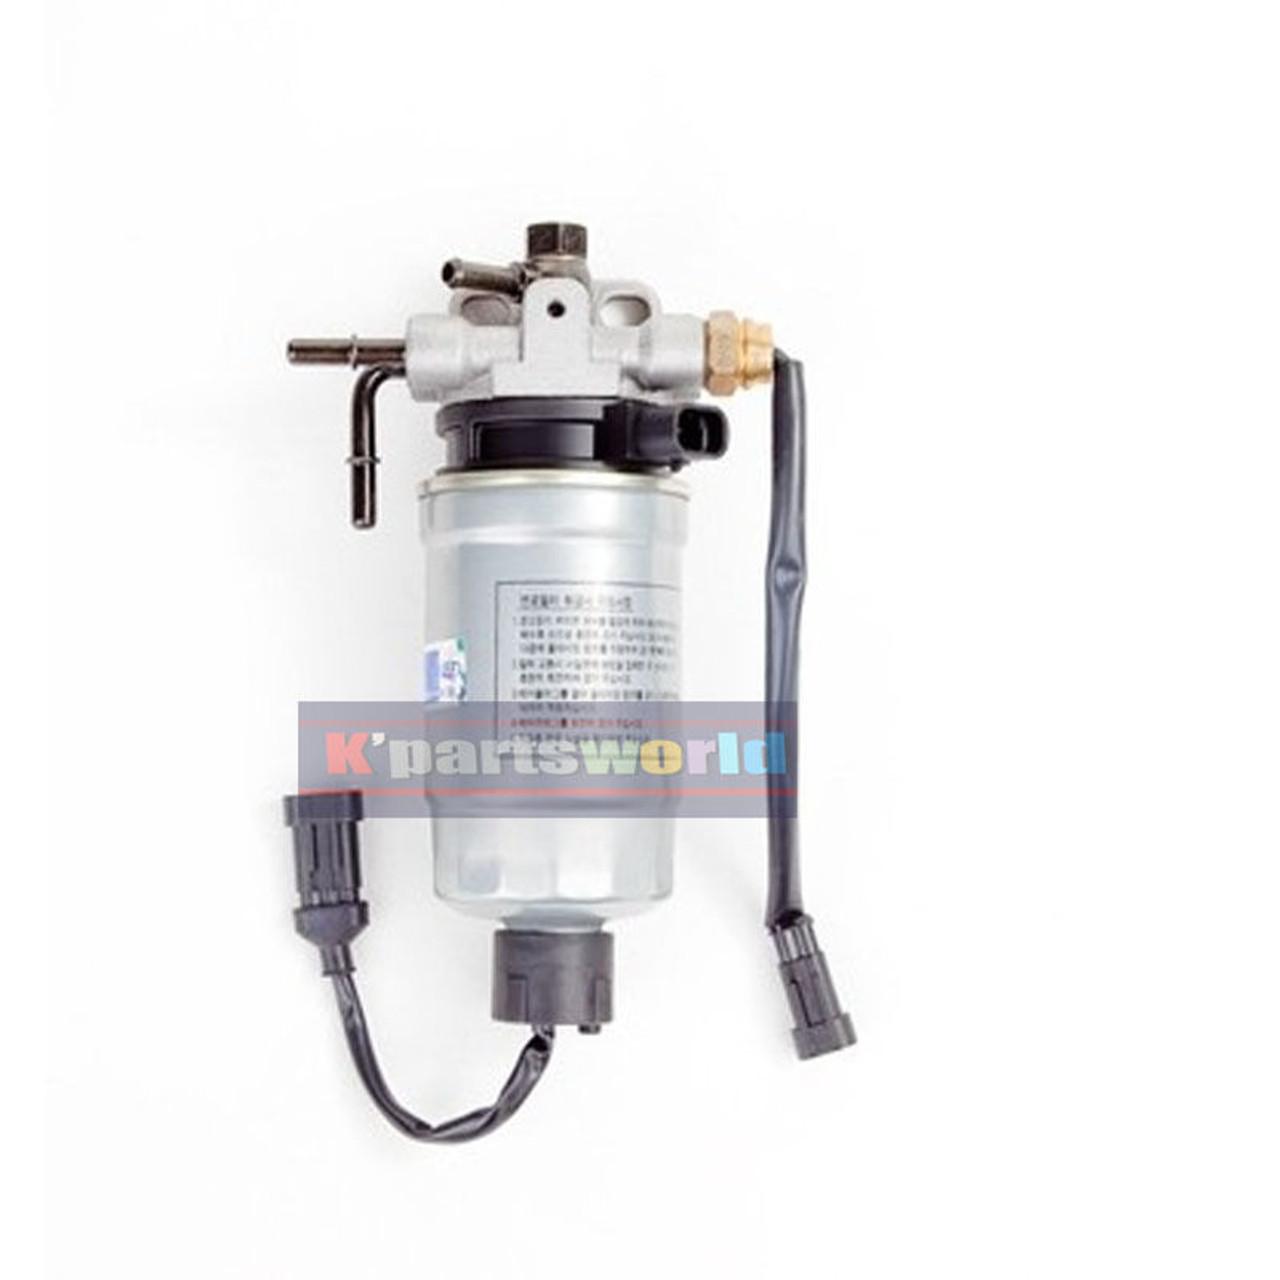 hight resolution of k243 fuel filter water separator assy for hyundai santafe cm 2 2 31970 2b901